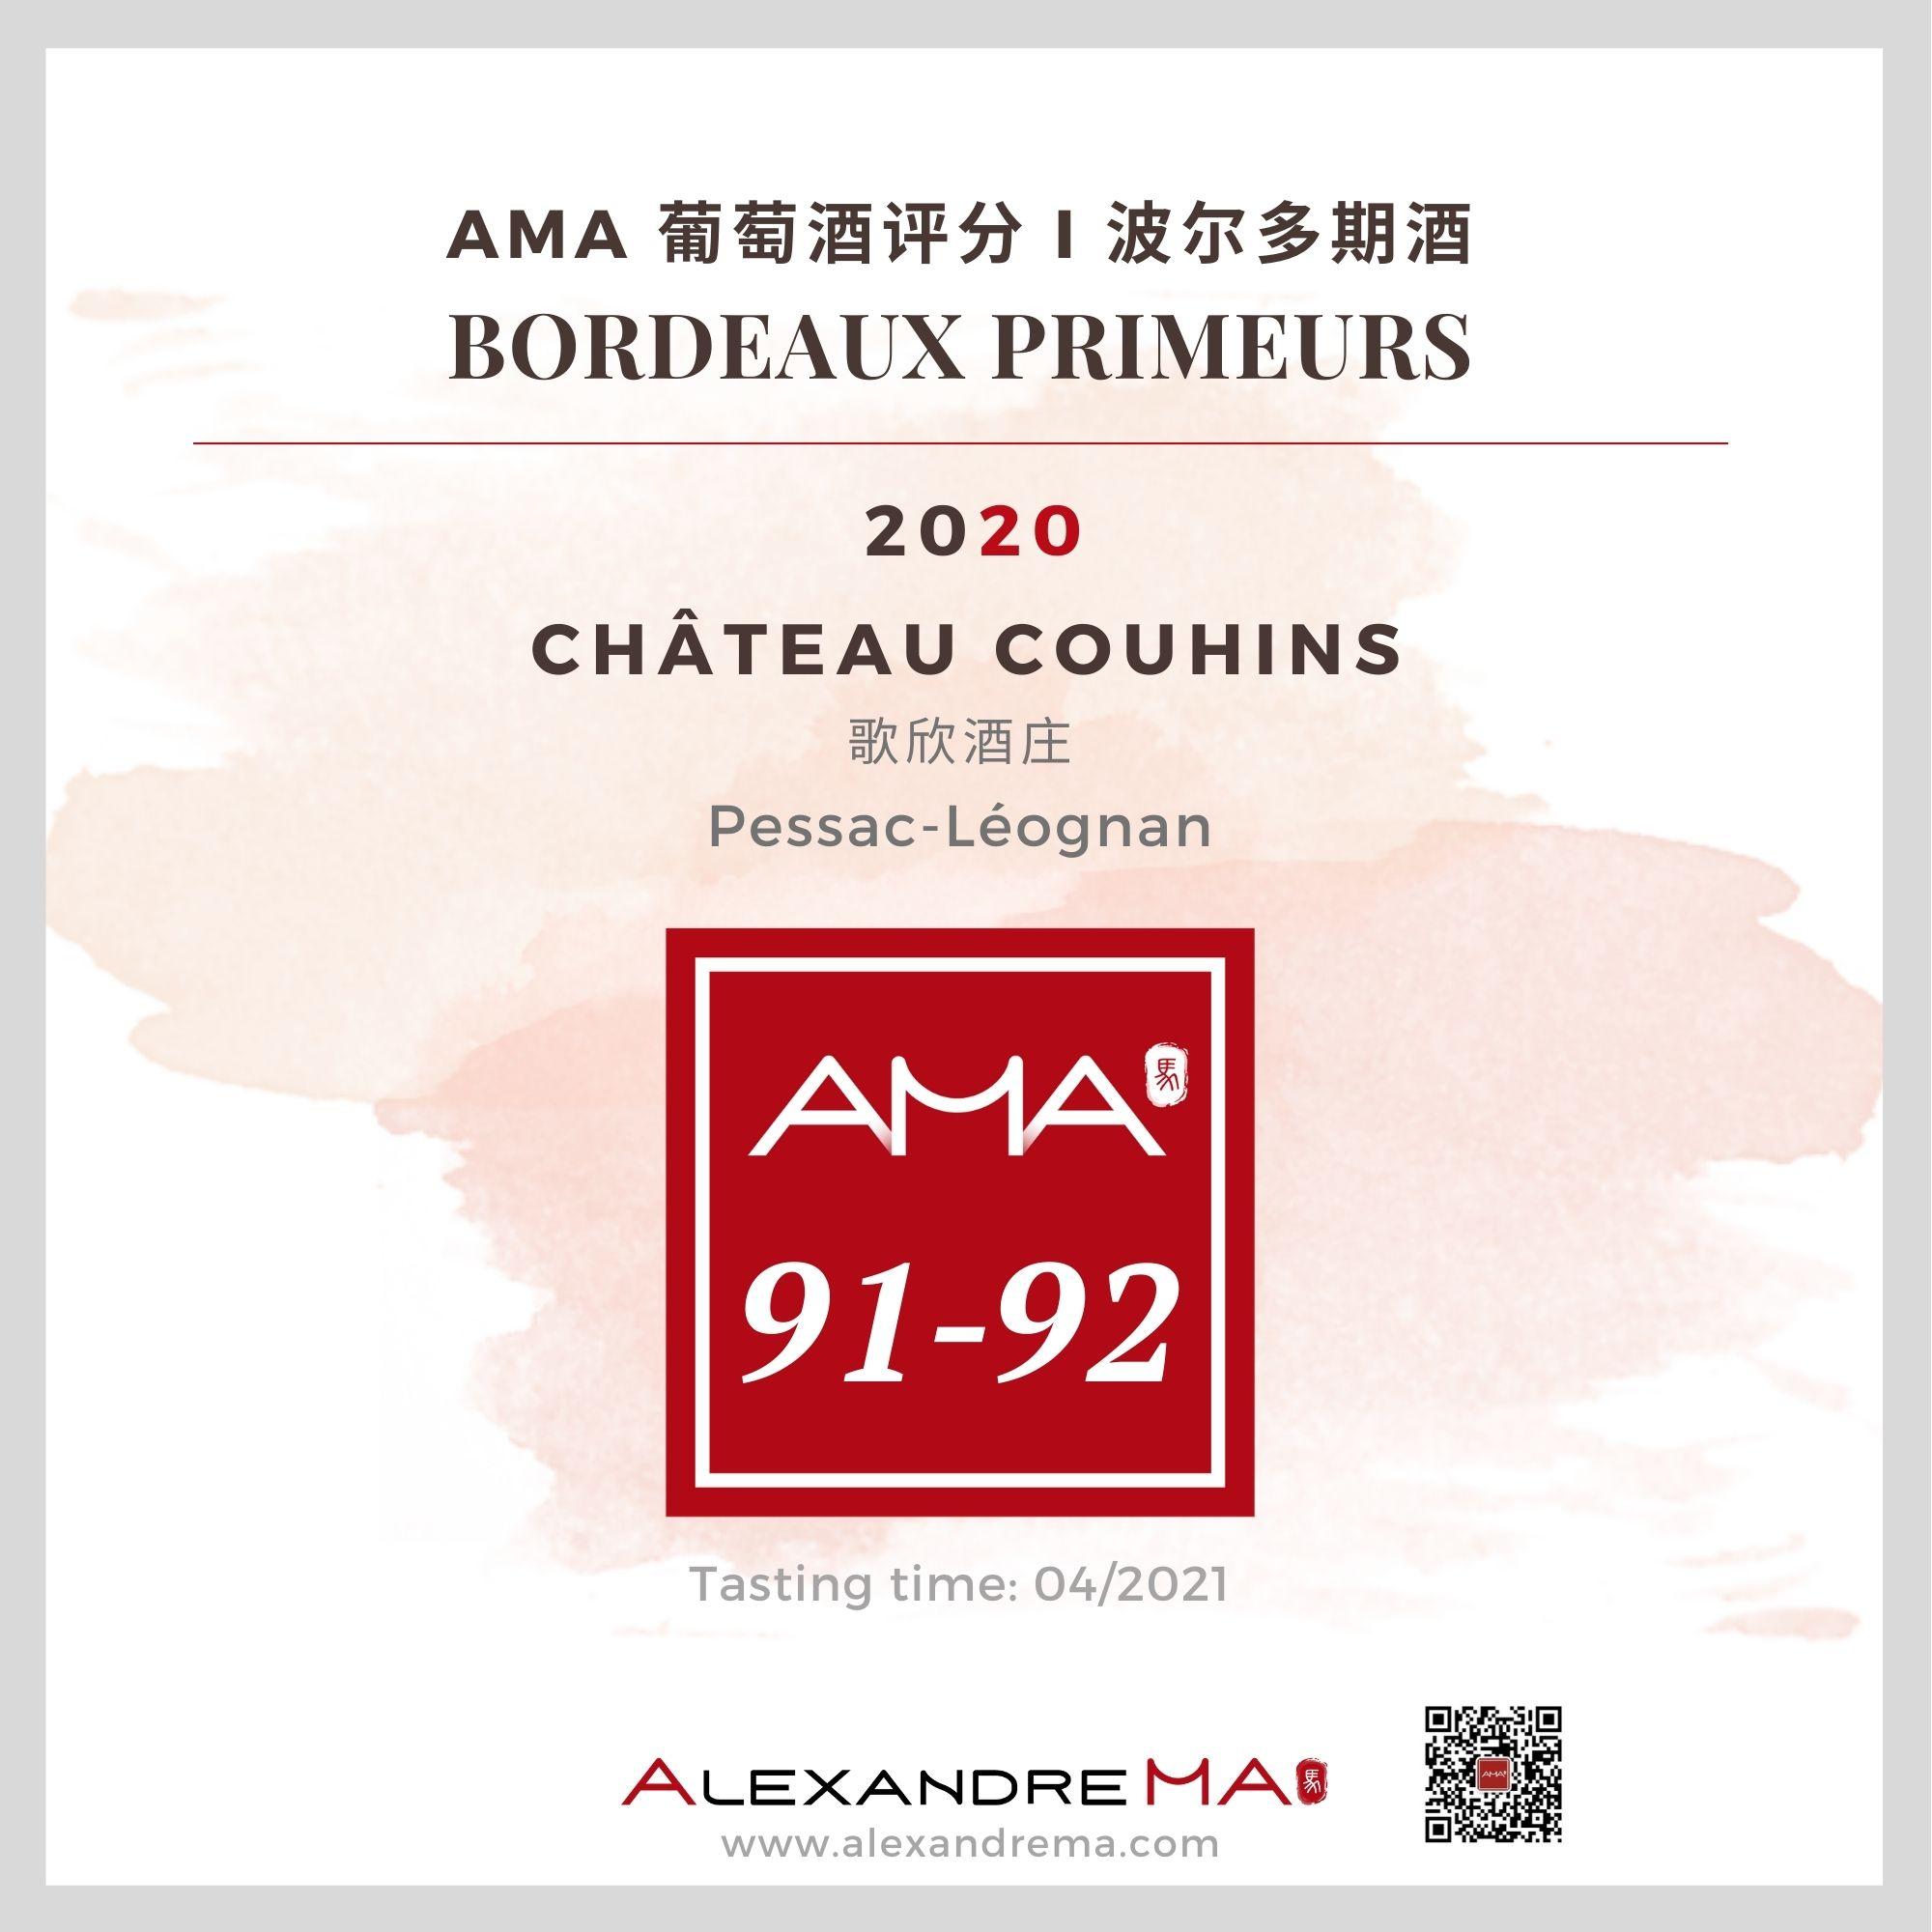 Château Couhins 2020 歌欣酒庄 - Alexandre Ma